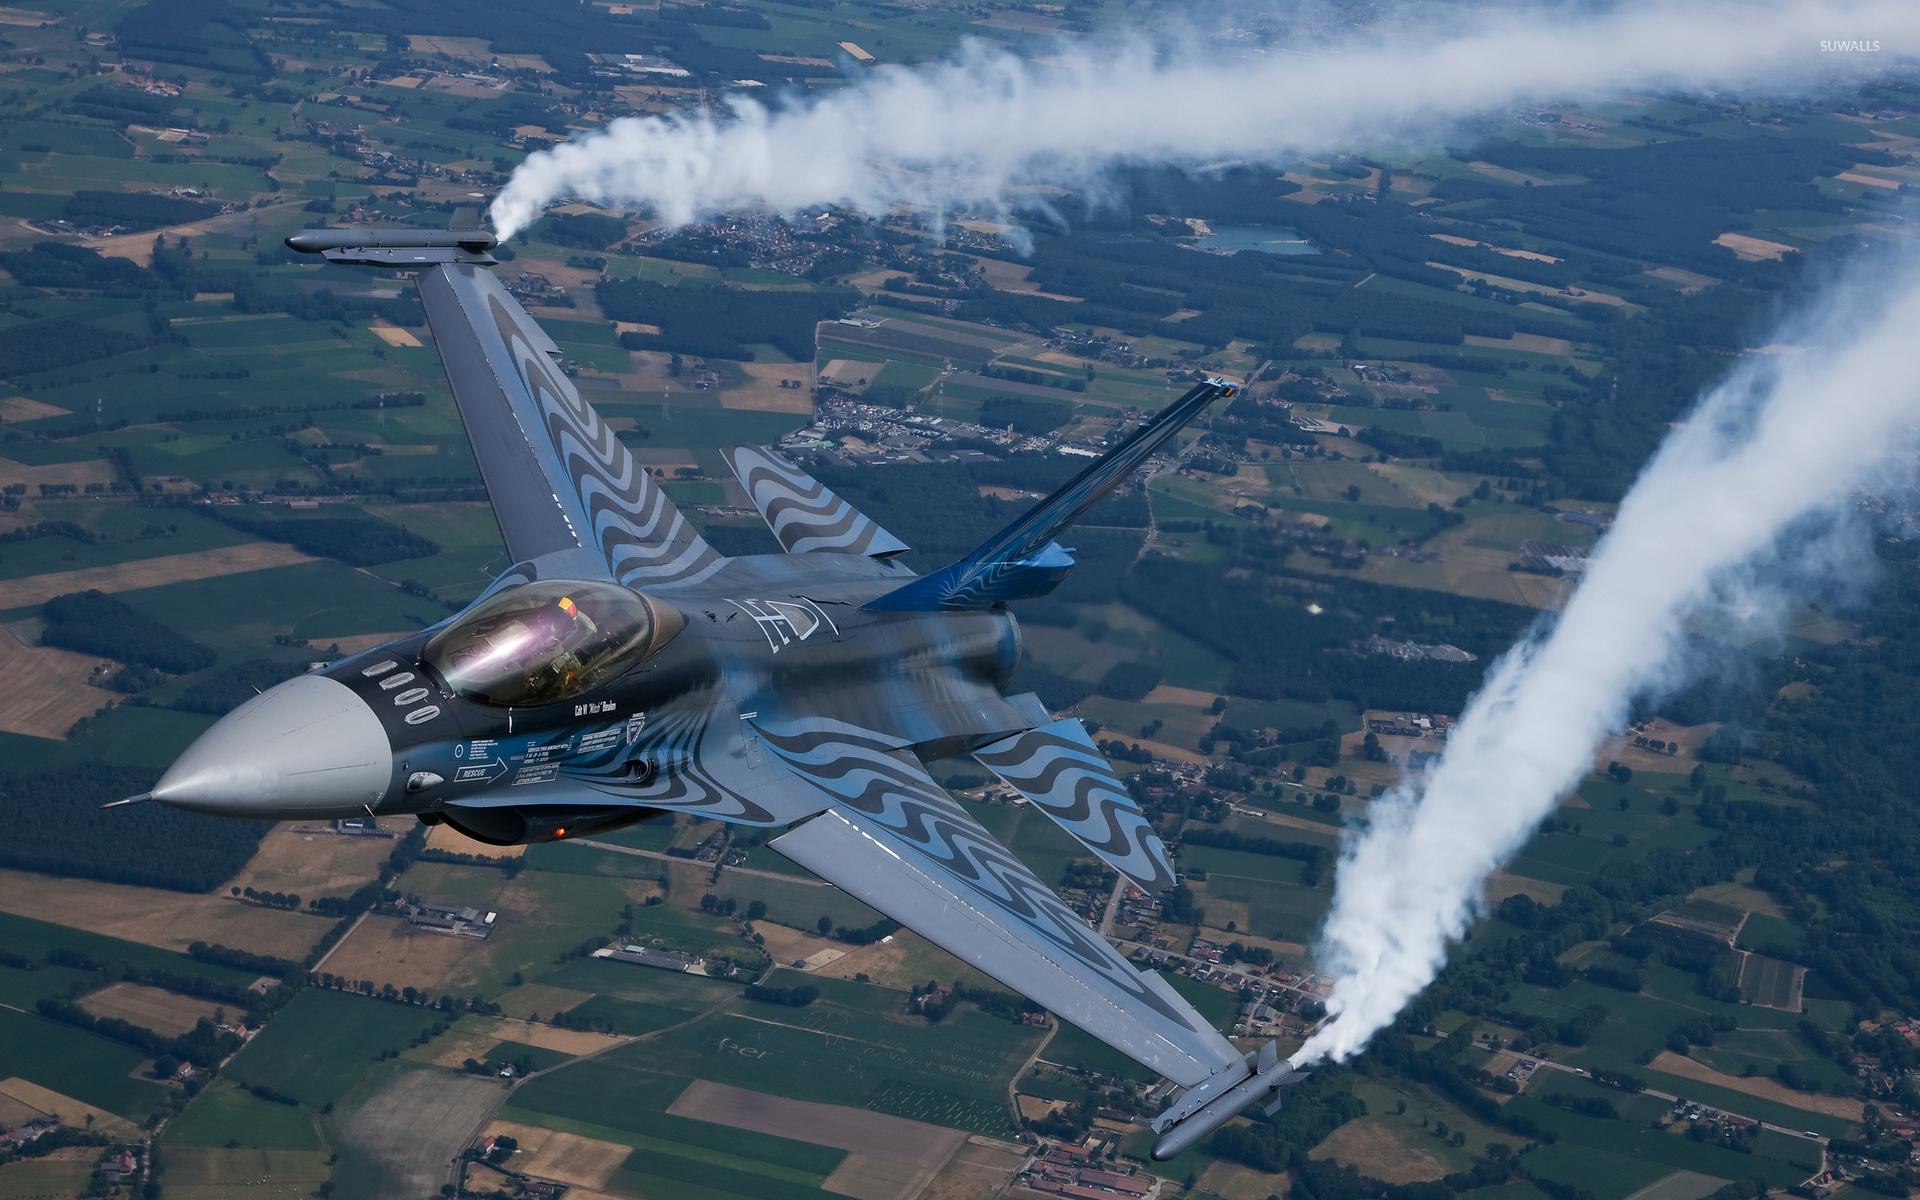 General Dynamics F-16 Fighting Falcon [3] Wallpaper